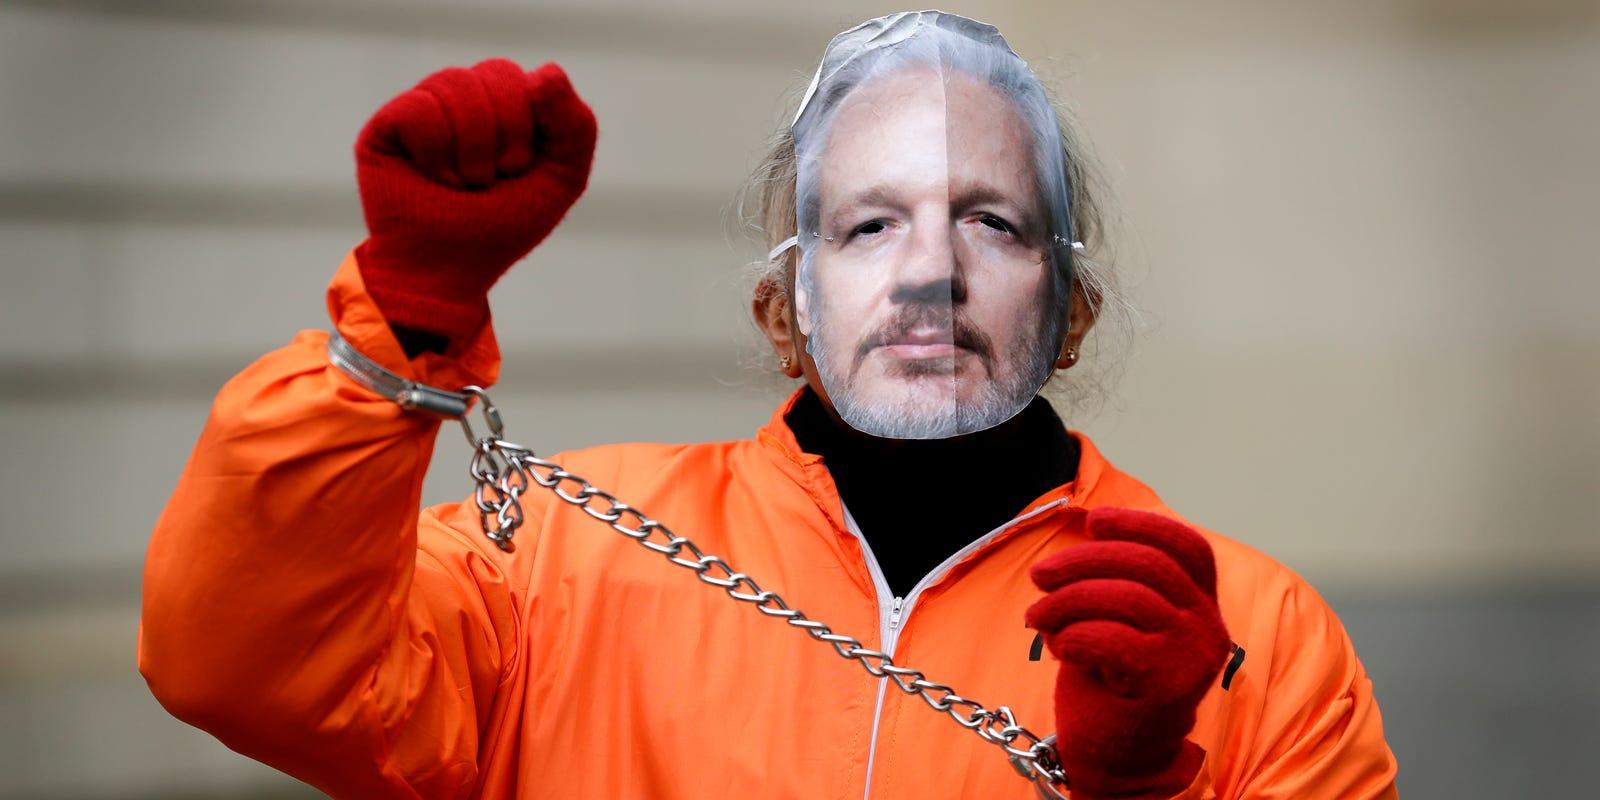 Julian Assange: What's at stake if U.S. prosecutes WikiLeaks founder